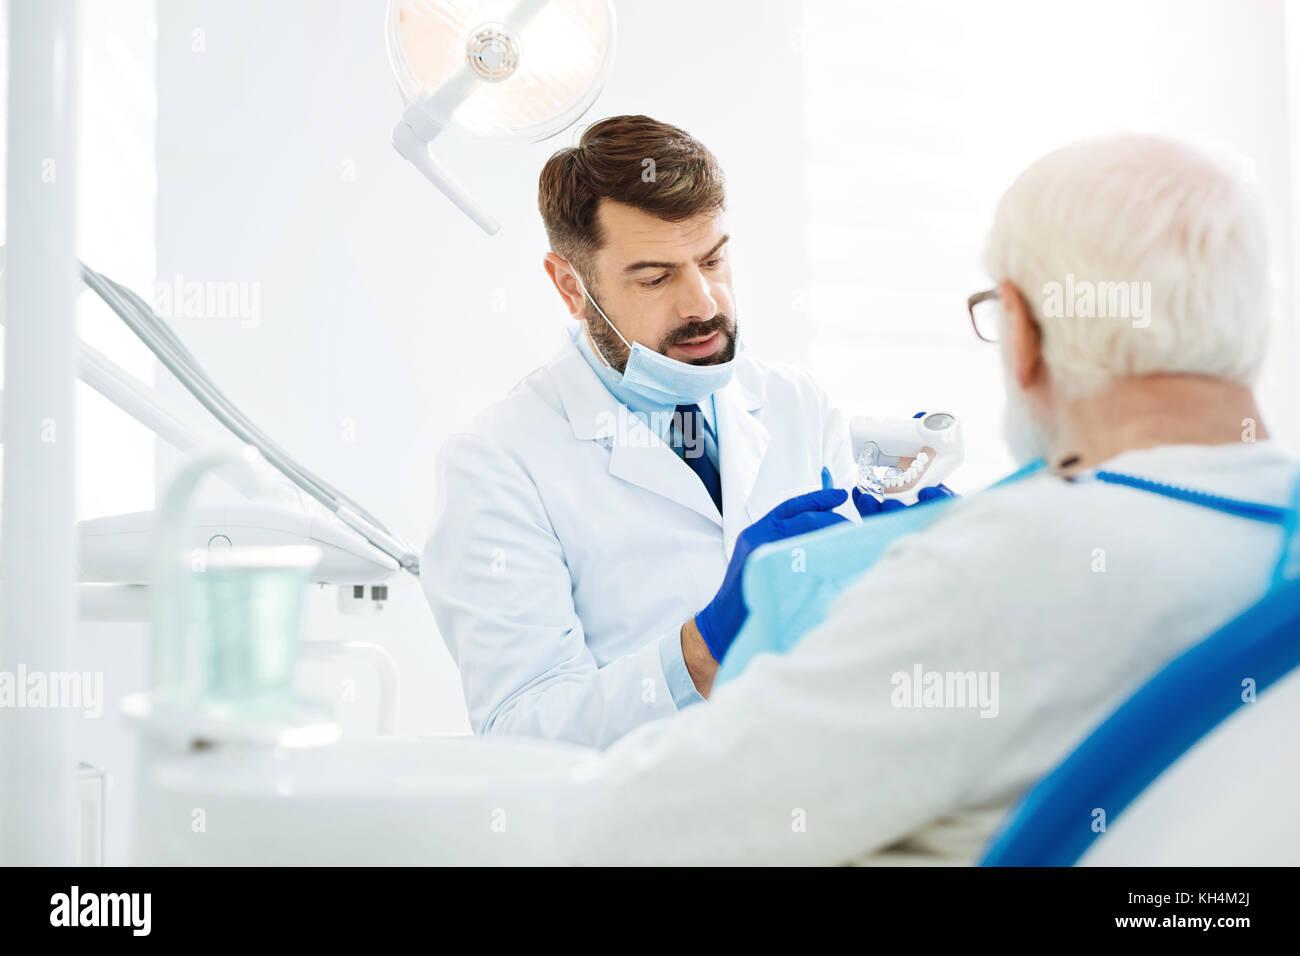 Aufmerksame stomatologist Holding falsche Zähne Hände Stockbild